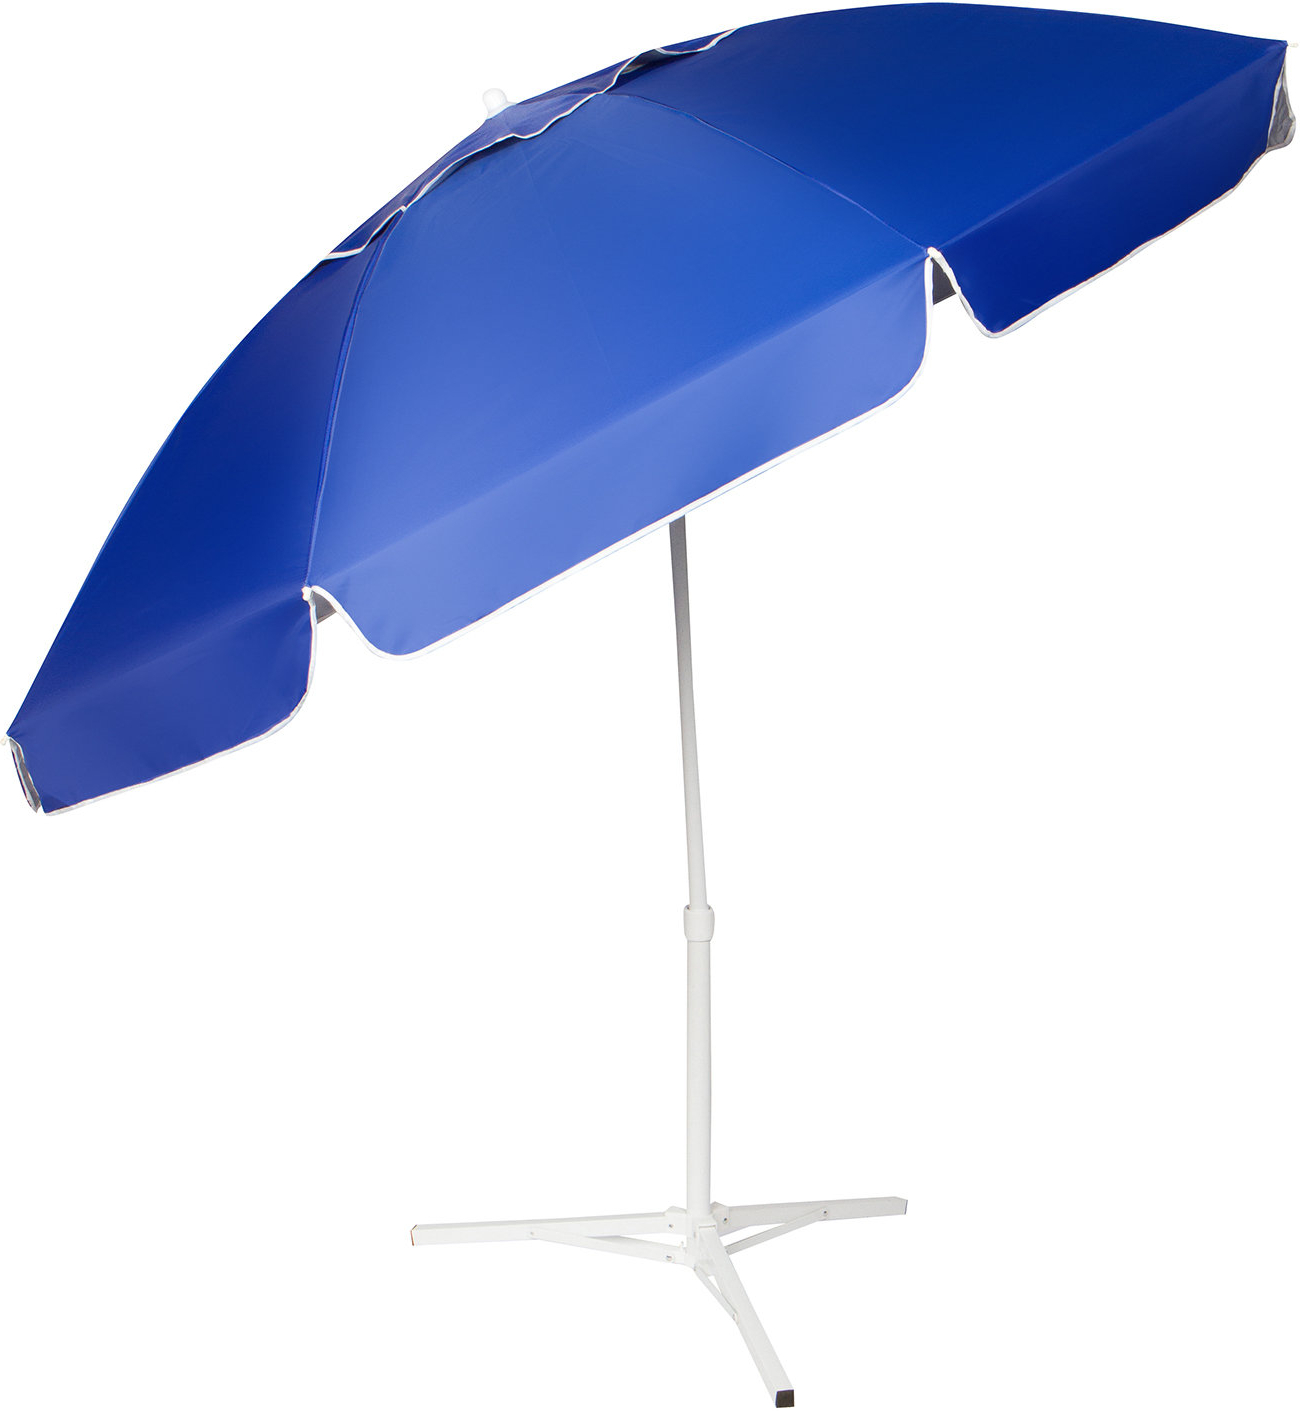 Alondra Ultimate Wondershade 5Beach Umbrellas In Most Recent Peachey Portable Beach And Sports 7' Market Umbrella (View 2 of 20)